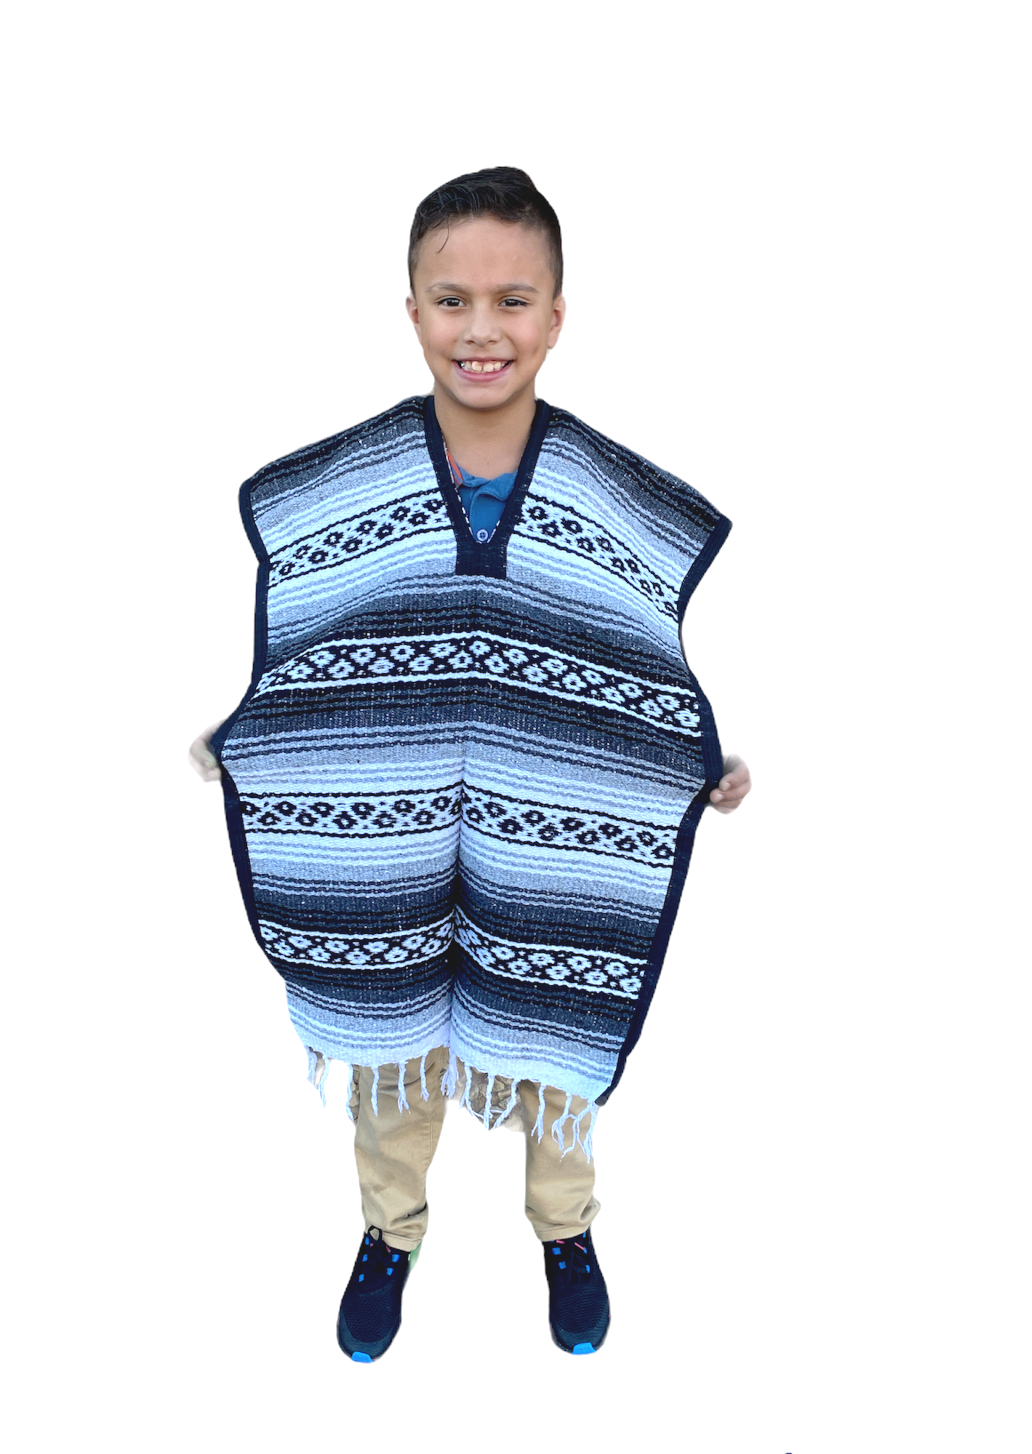 MEXICAN KIDS PONCHO , FALSA , COSTUME ,BLANKET SERAPE GABAN ,KIDS 8 - 12 ,GRAY